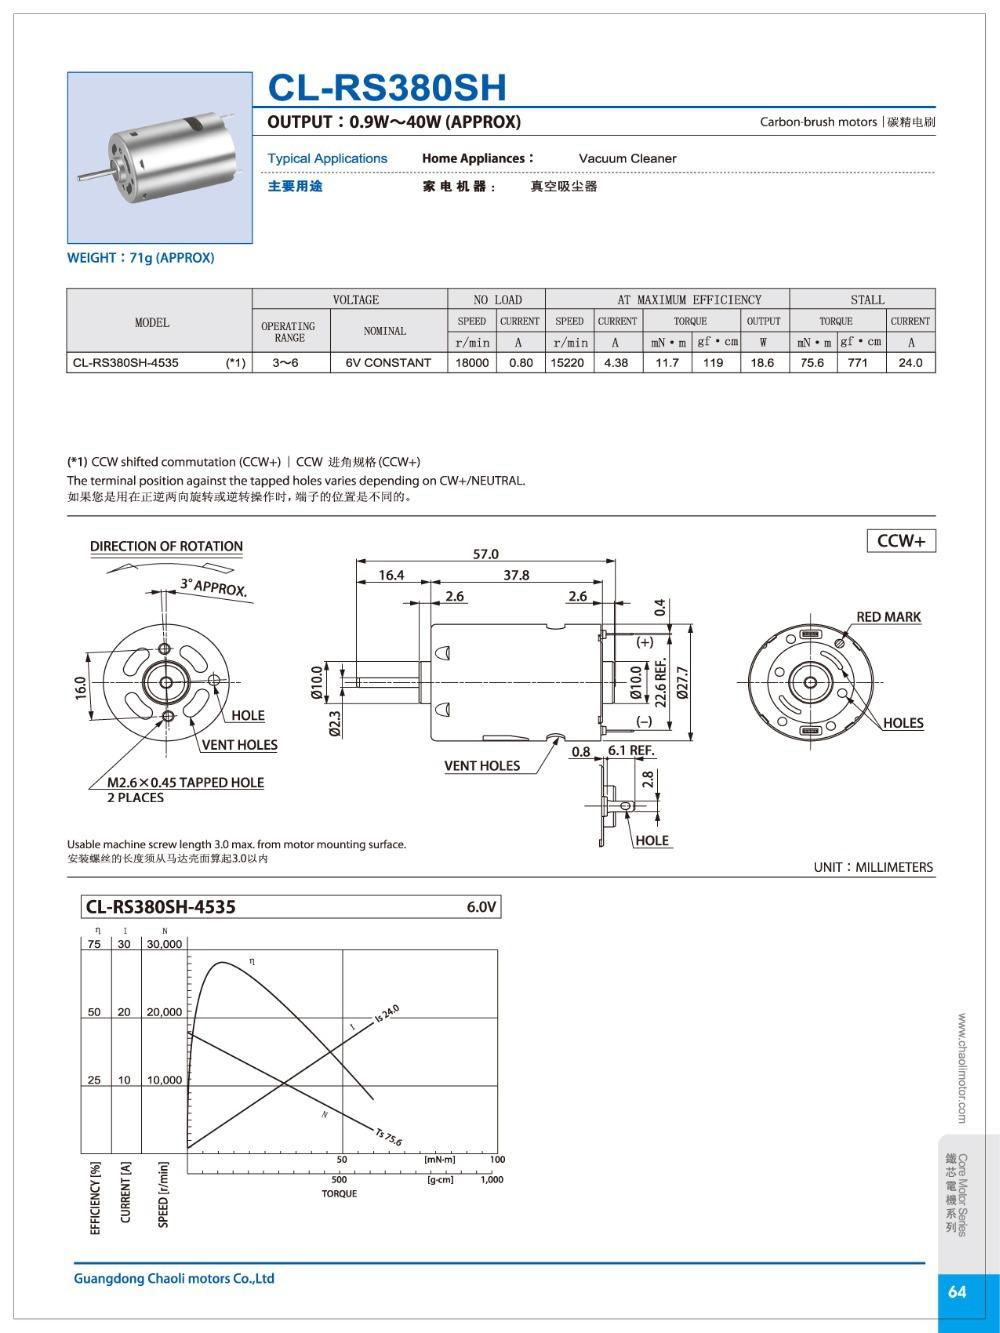 Wide Speed Regulating Range Spg Motor Cl Rs380sh For Intelligent Vem Wiring Diagram Housing Dfl 277378mm Material Secd O Shaft Diameter 23mm Carbon Steel Nickel Coating Way Of Commutation Brush